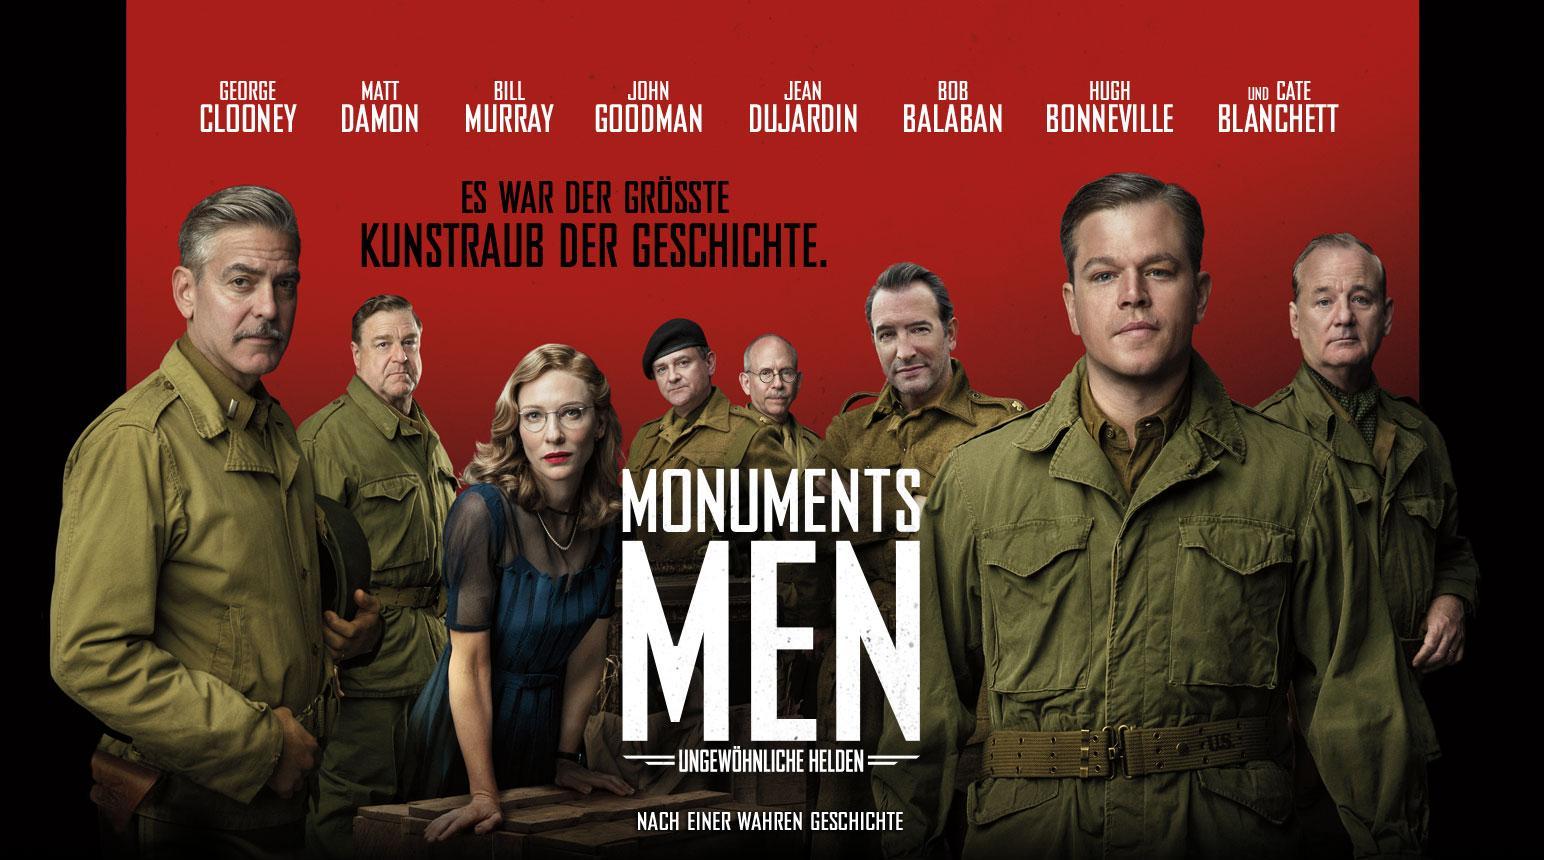 Monuments Men (2014) Filmkritik